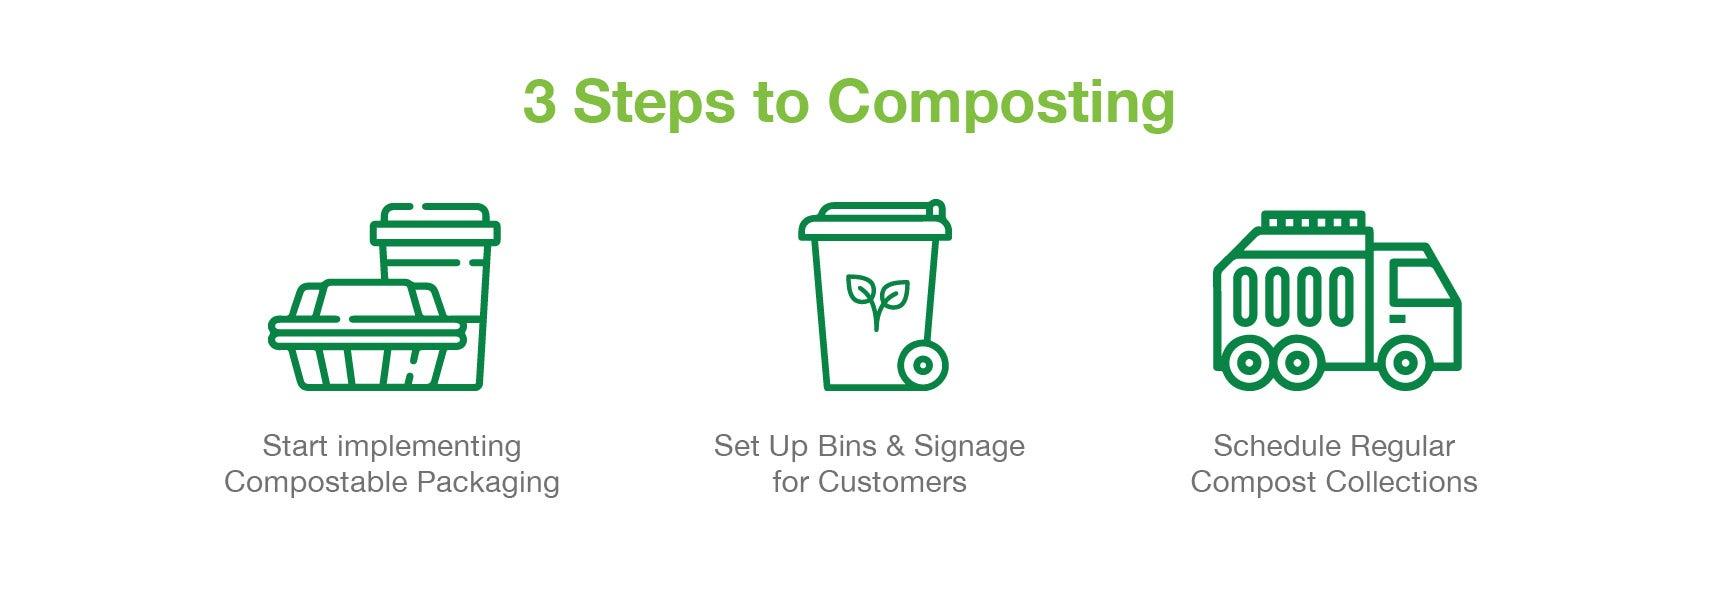 steps-to-composting-01-01.jpg